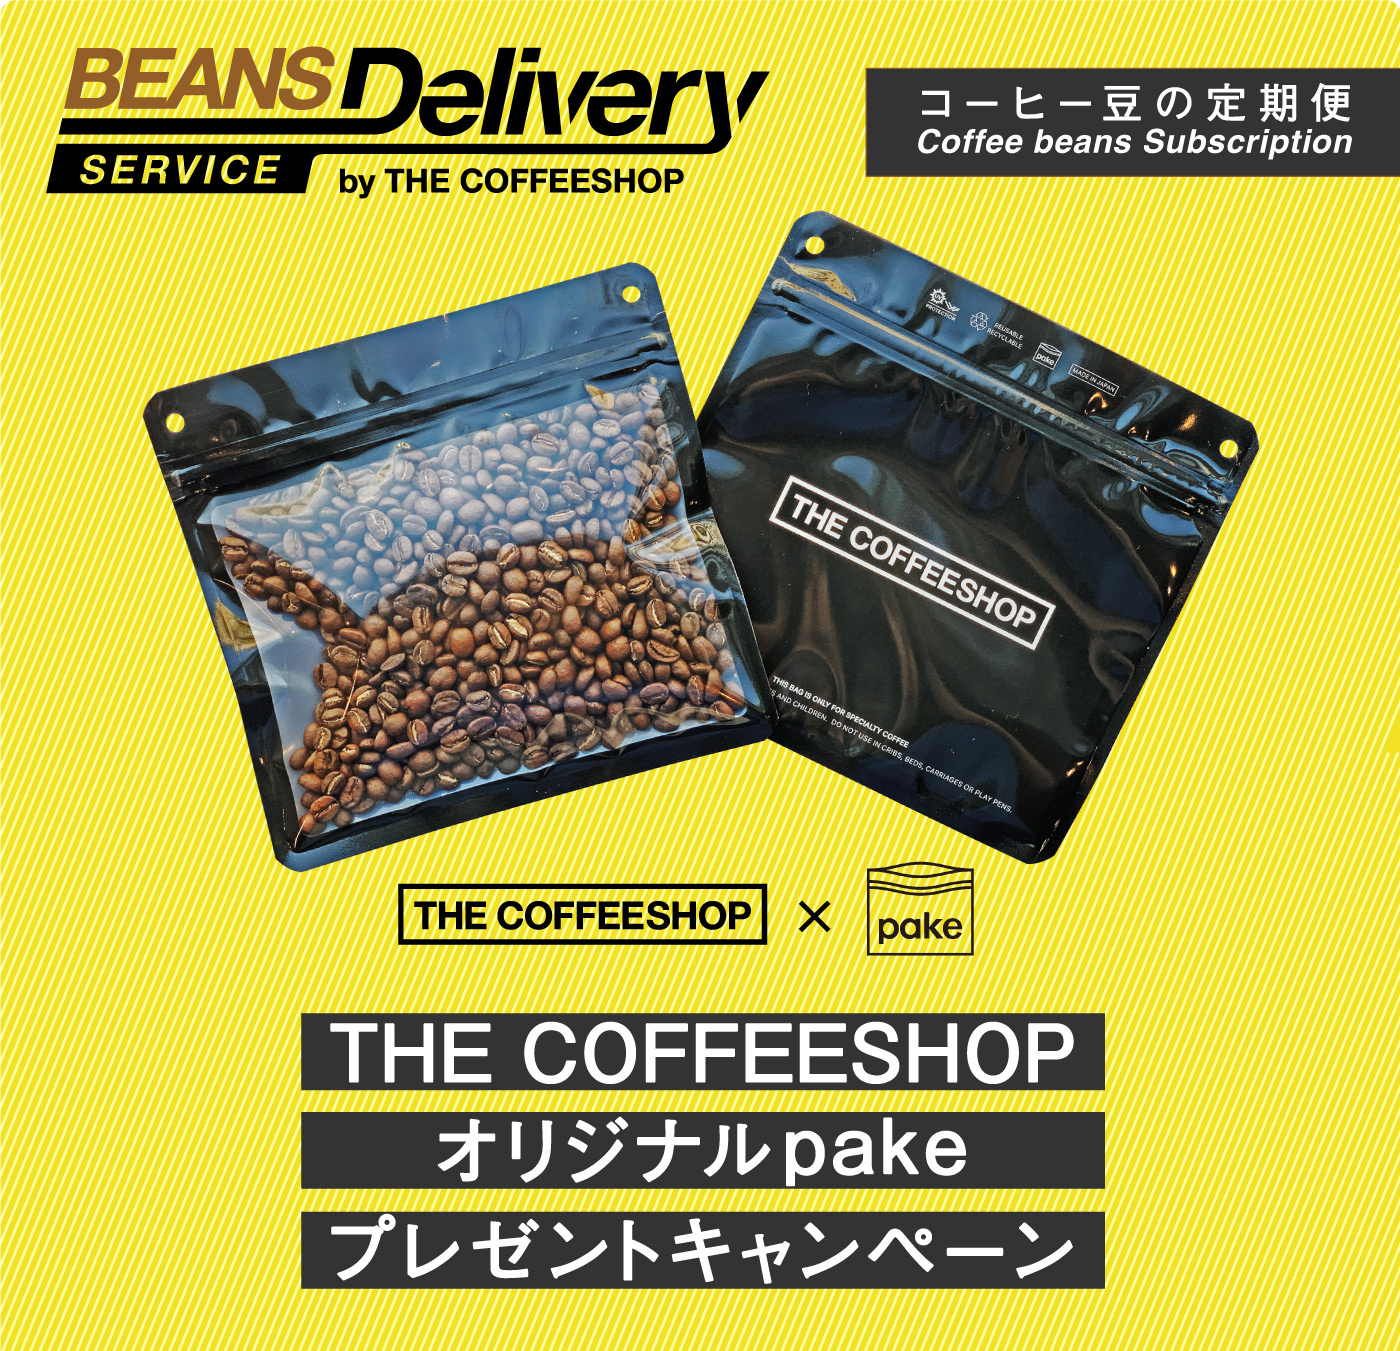 Beans Delivery Service 在宅勤務を応援!pakeプレゼントキャンペーン